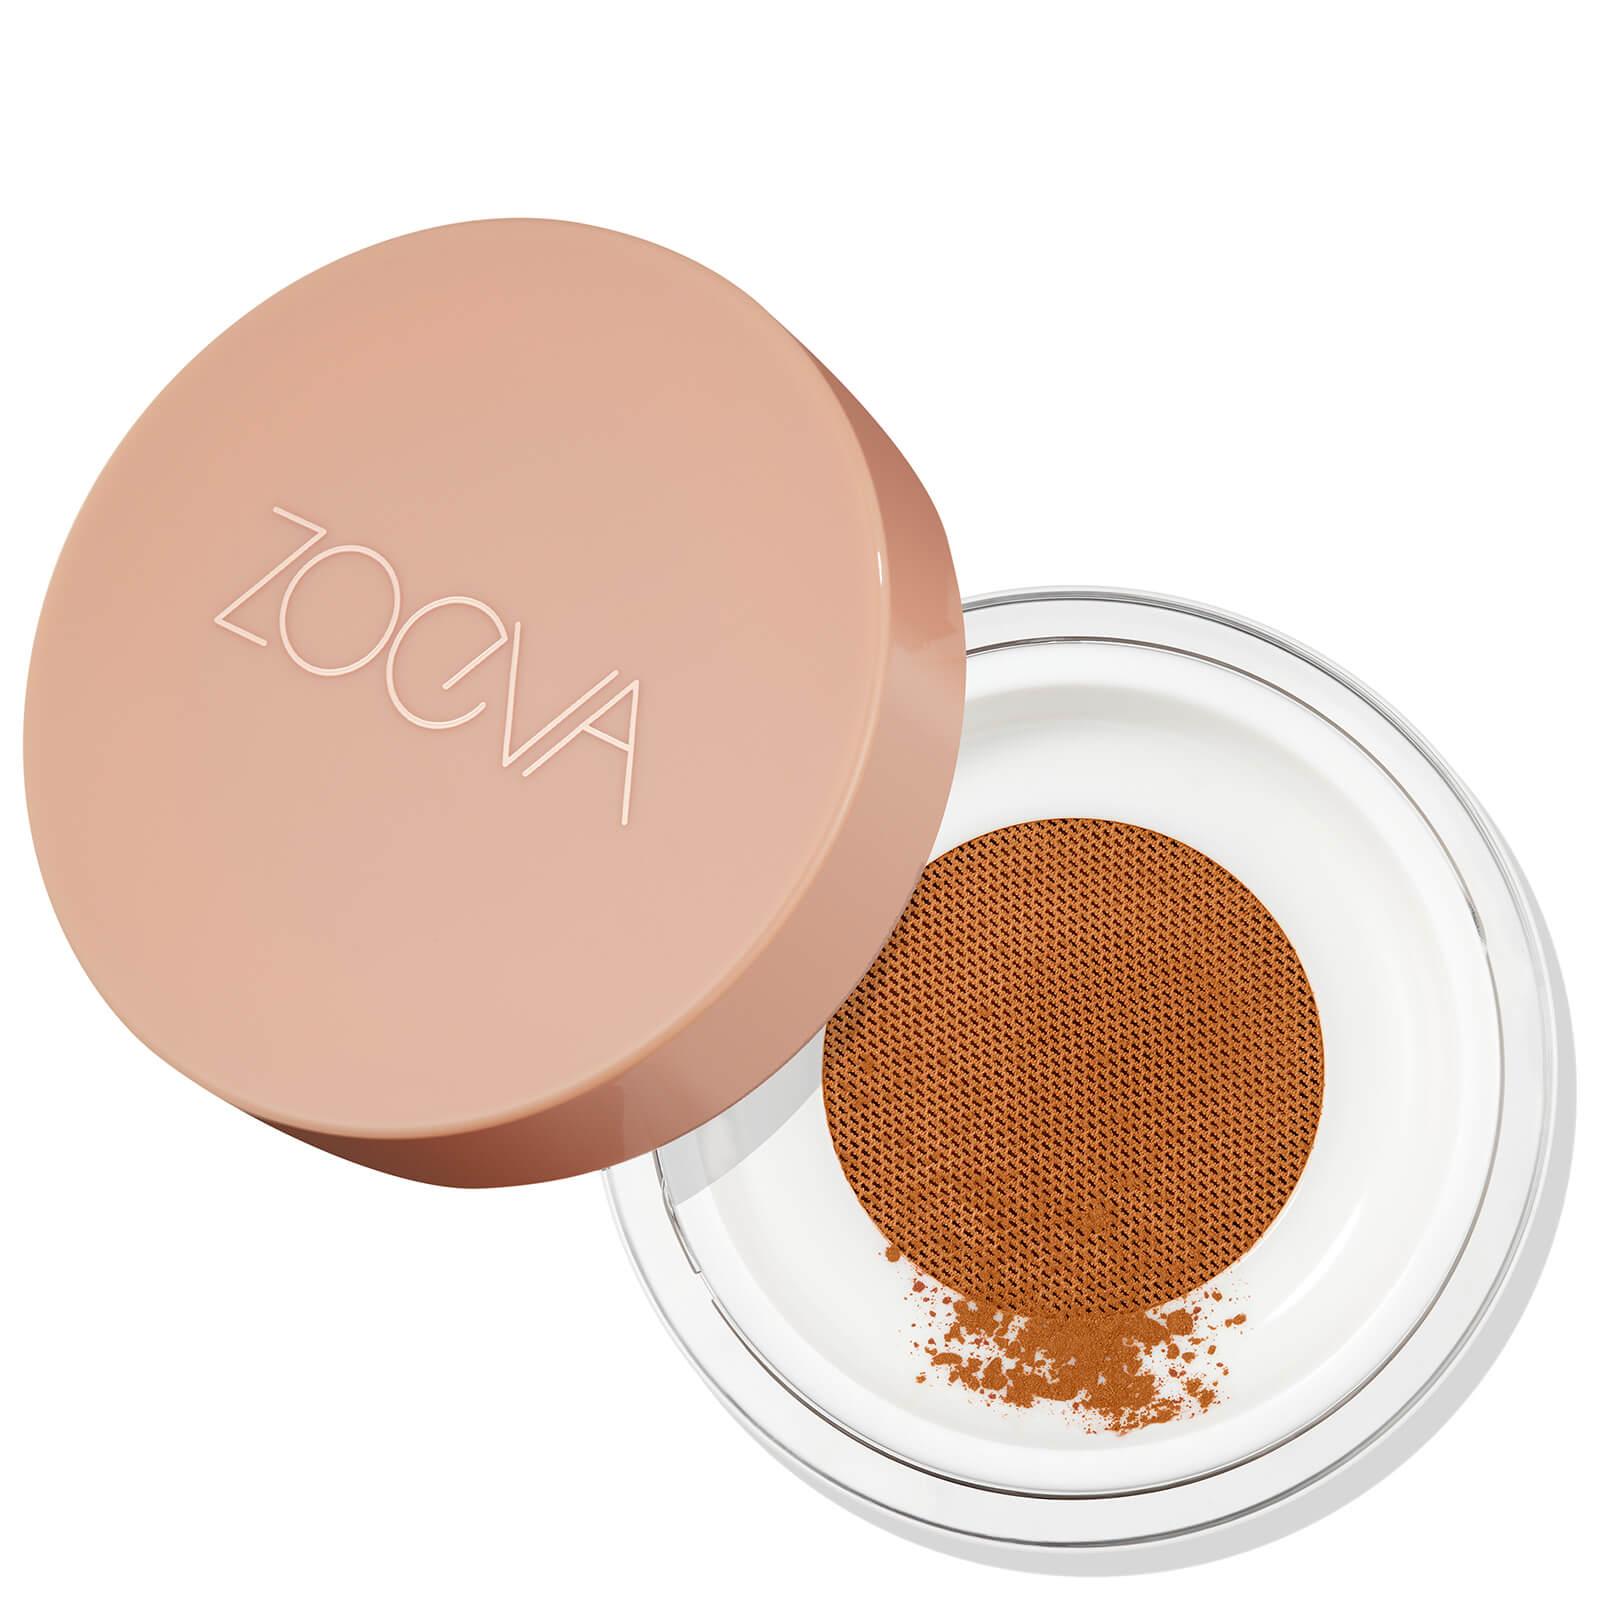 Купить ZOEVA Authentik Skin Finishing Powder 14g (Various Shades) - Exquisite